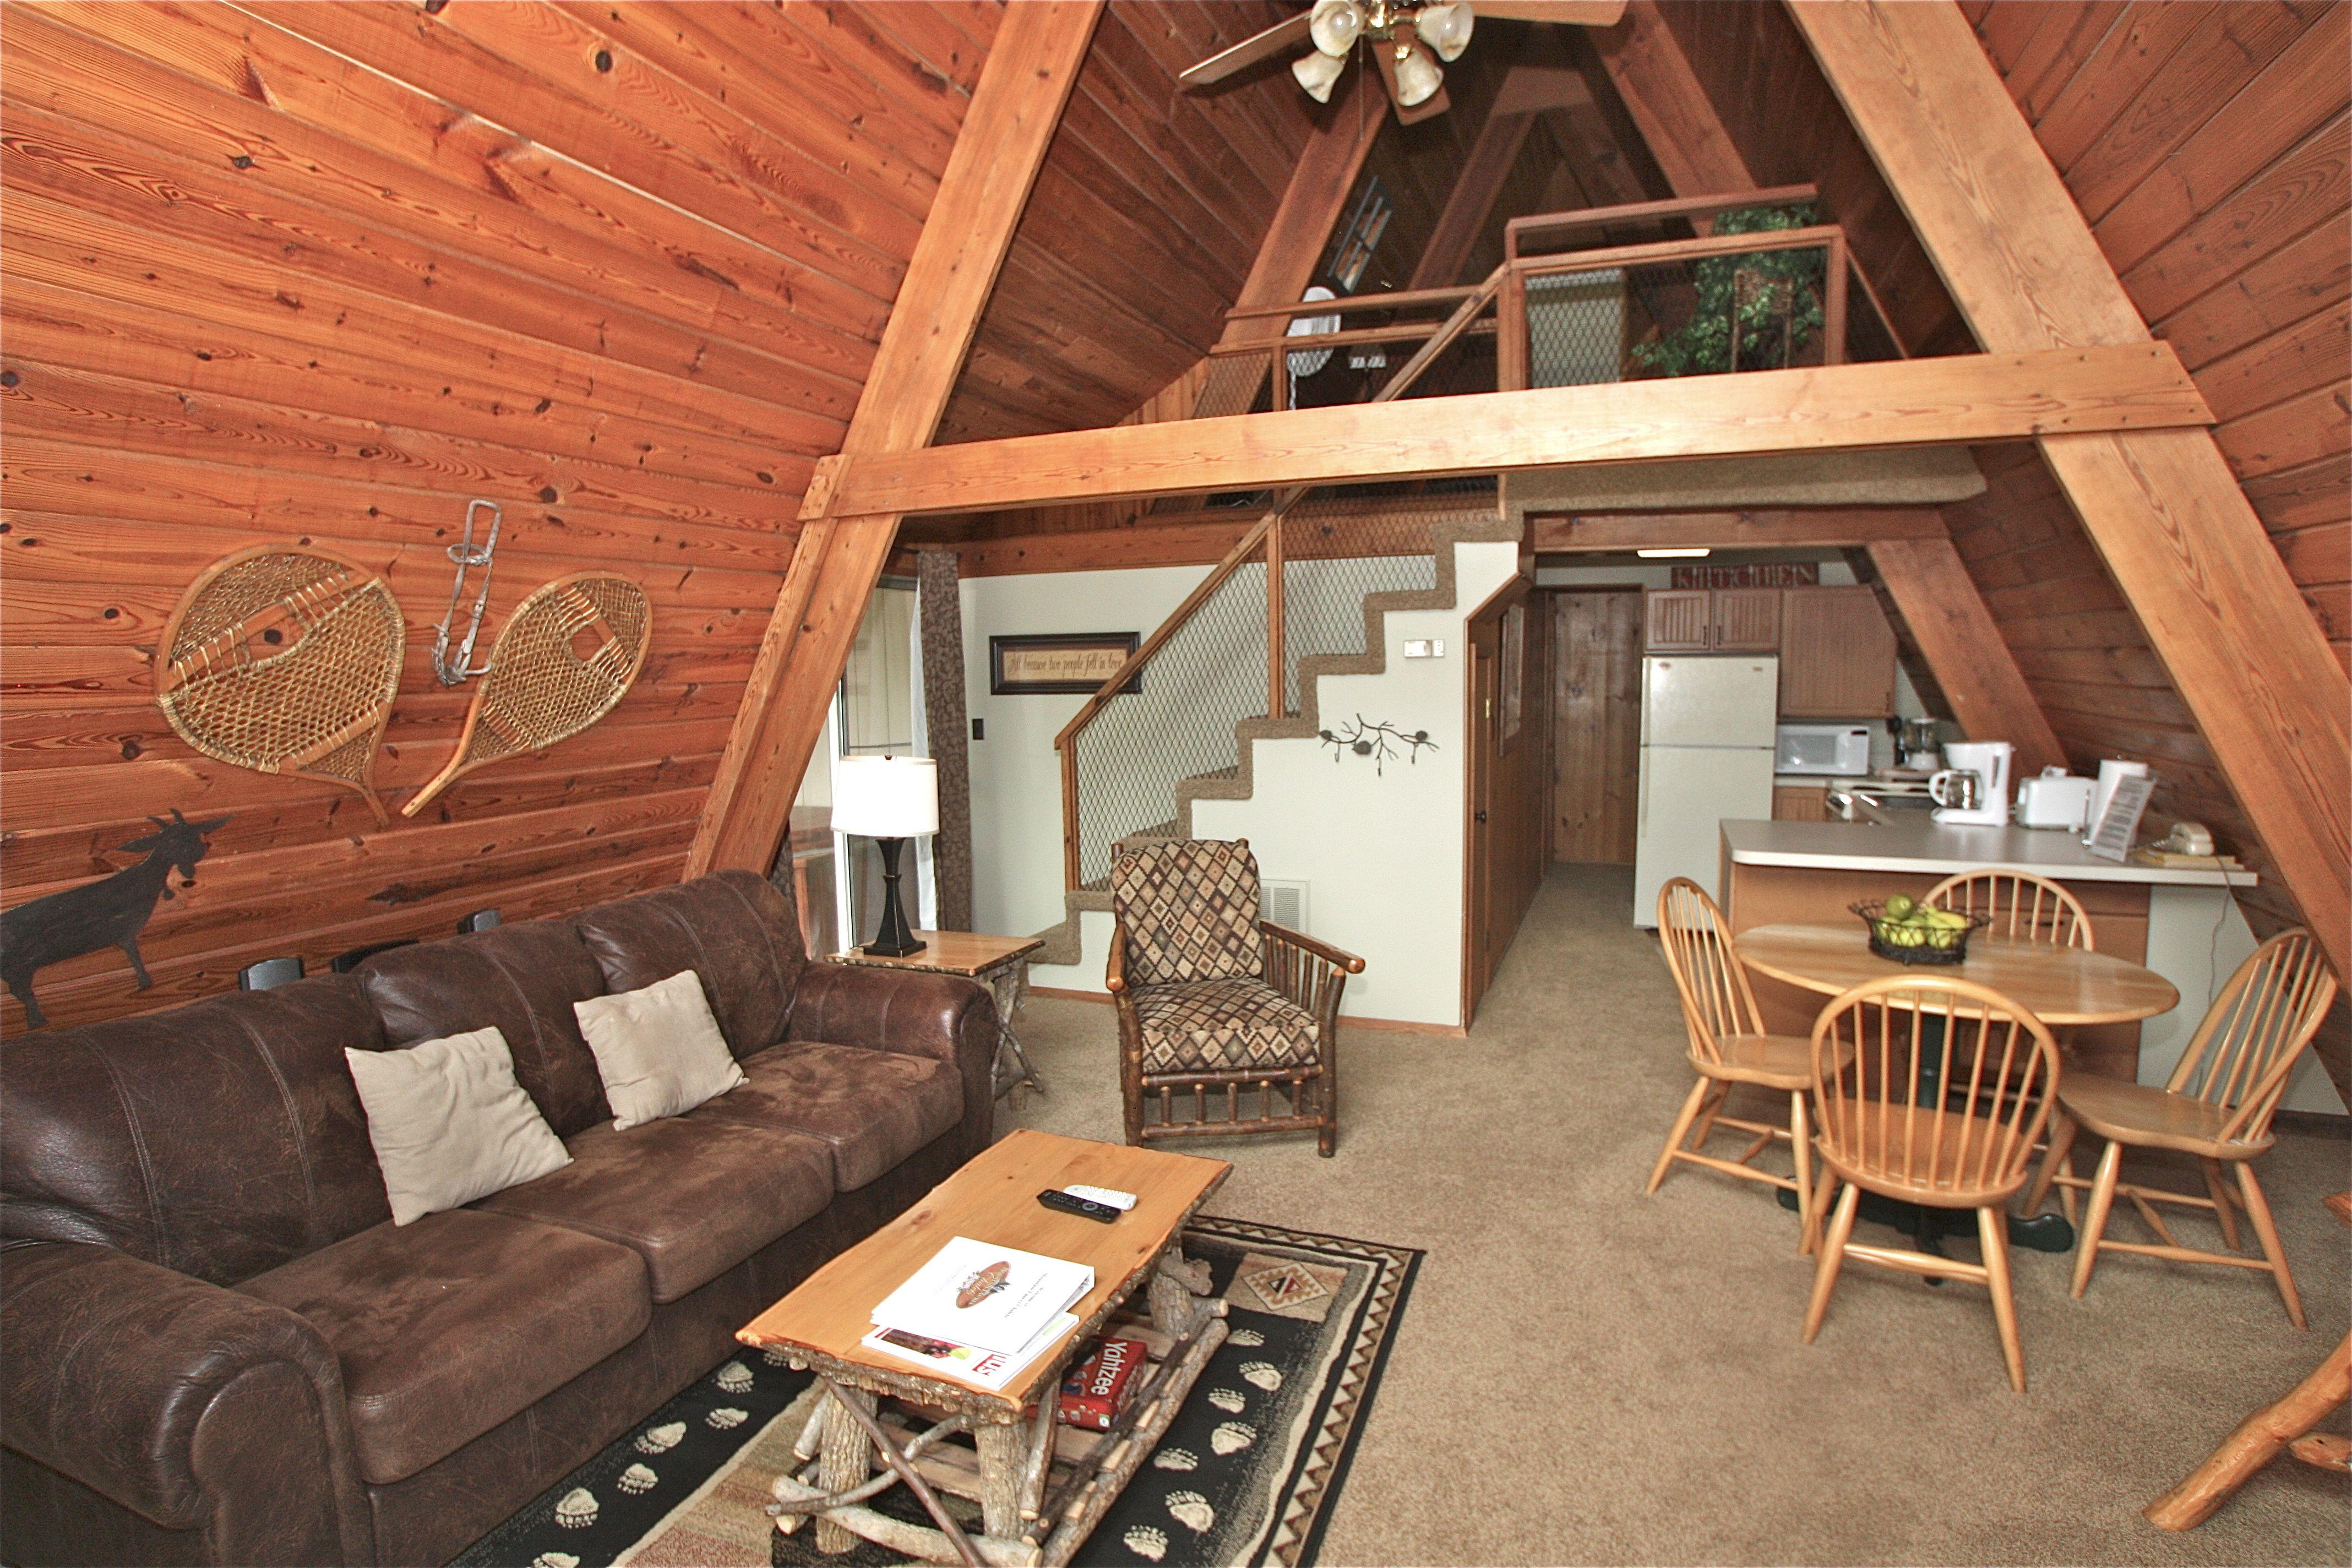 Pinetop a 1 bedroom cabin in gatlinburg tennessee - 1 bedroom cabin rentals gatlinburg tn ...